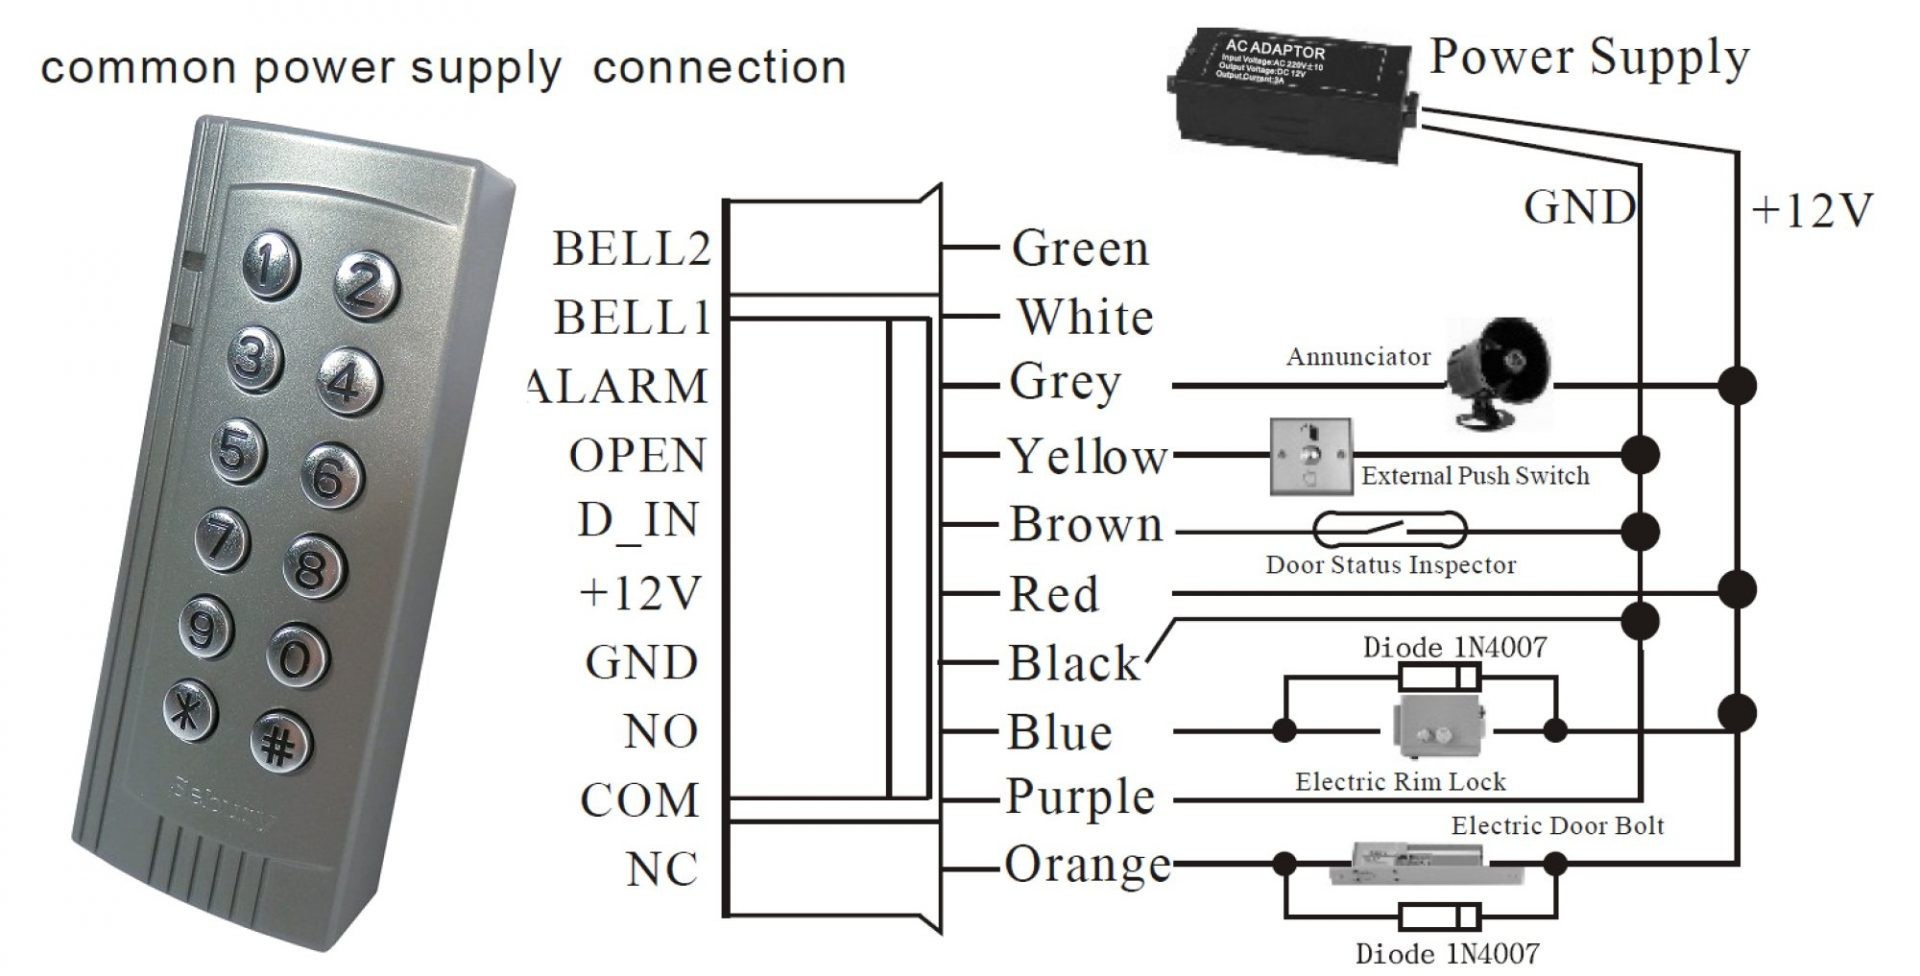 Wiring Diagram To Maglock Iei Keypad - DIY Wiring Diagrams •